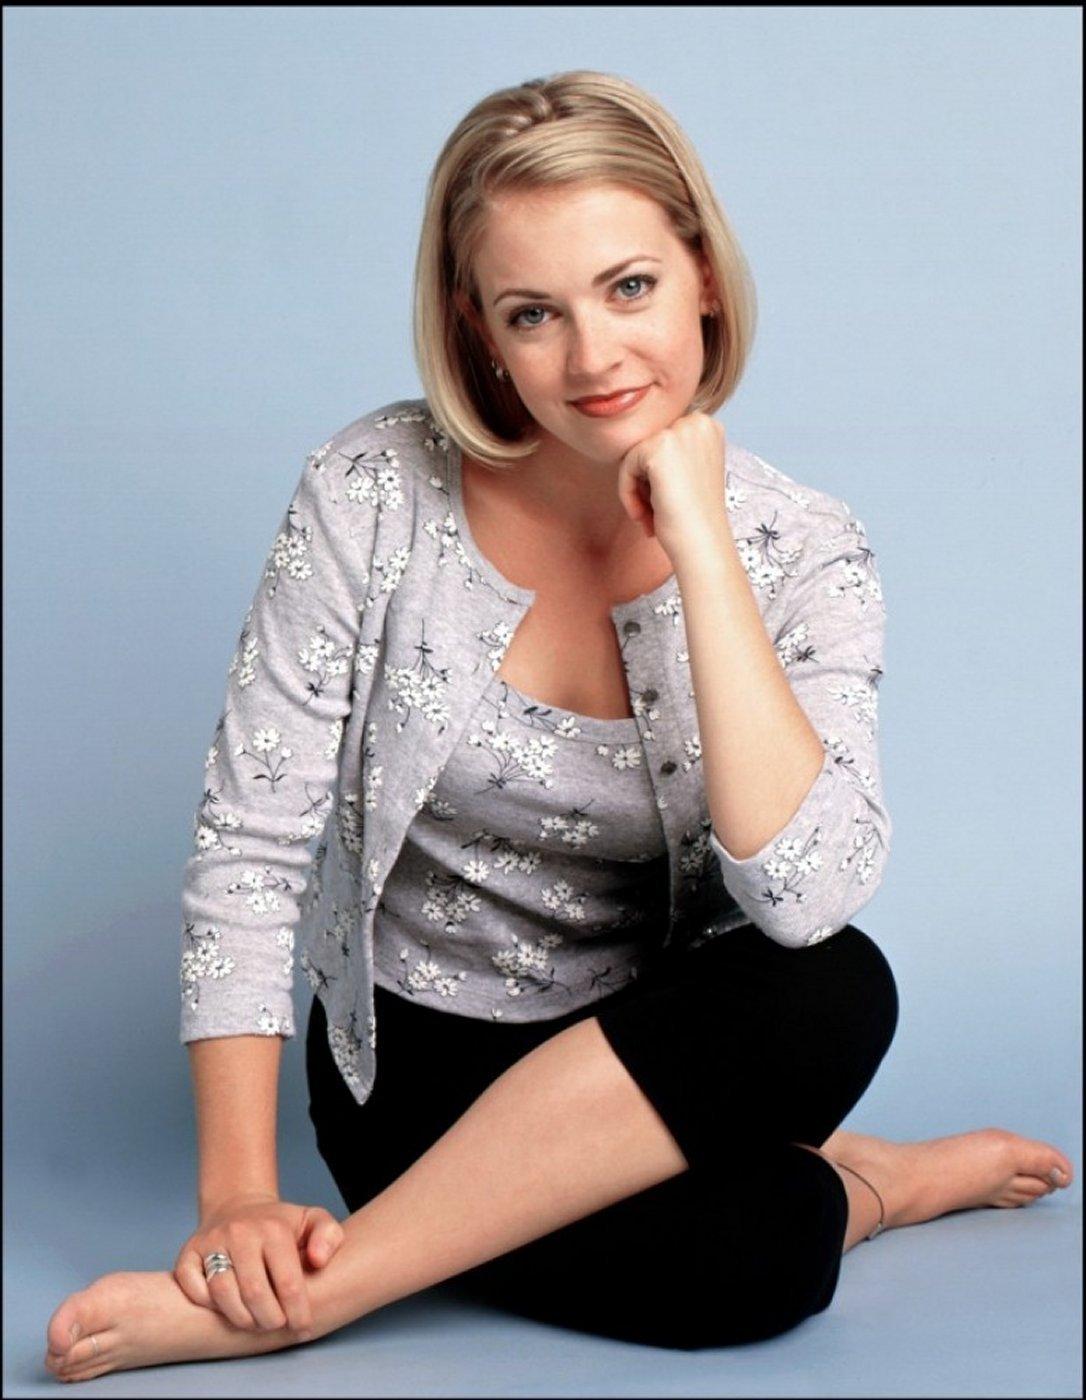 Assured, that Melissa jone hart pantyhose